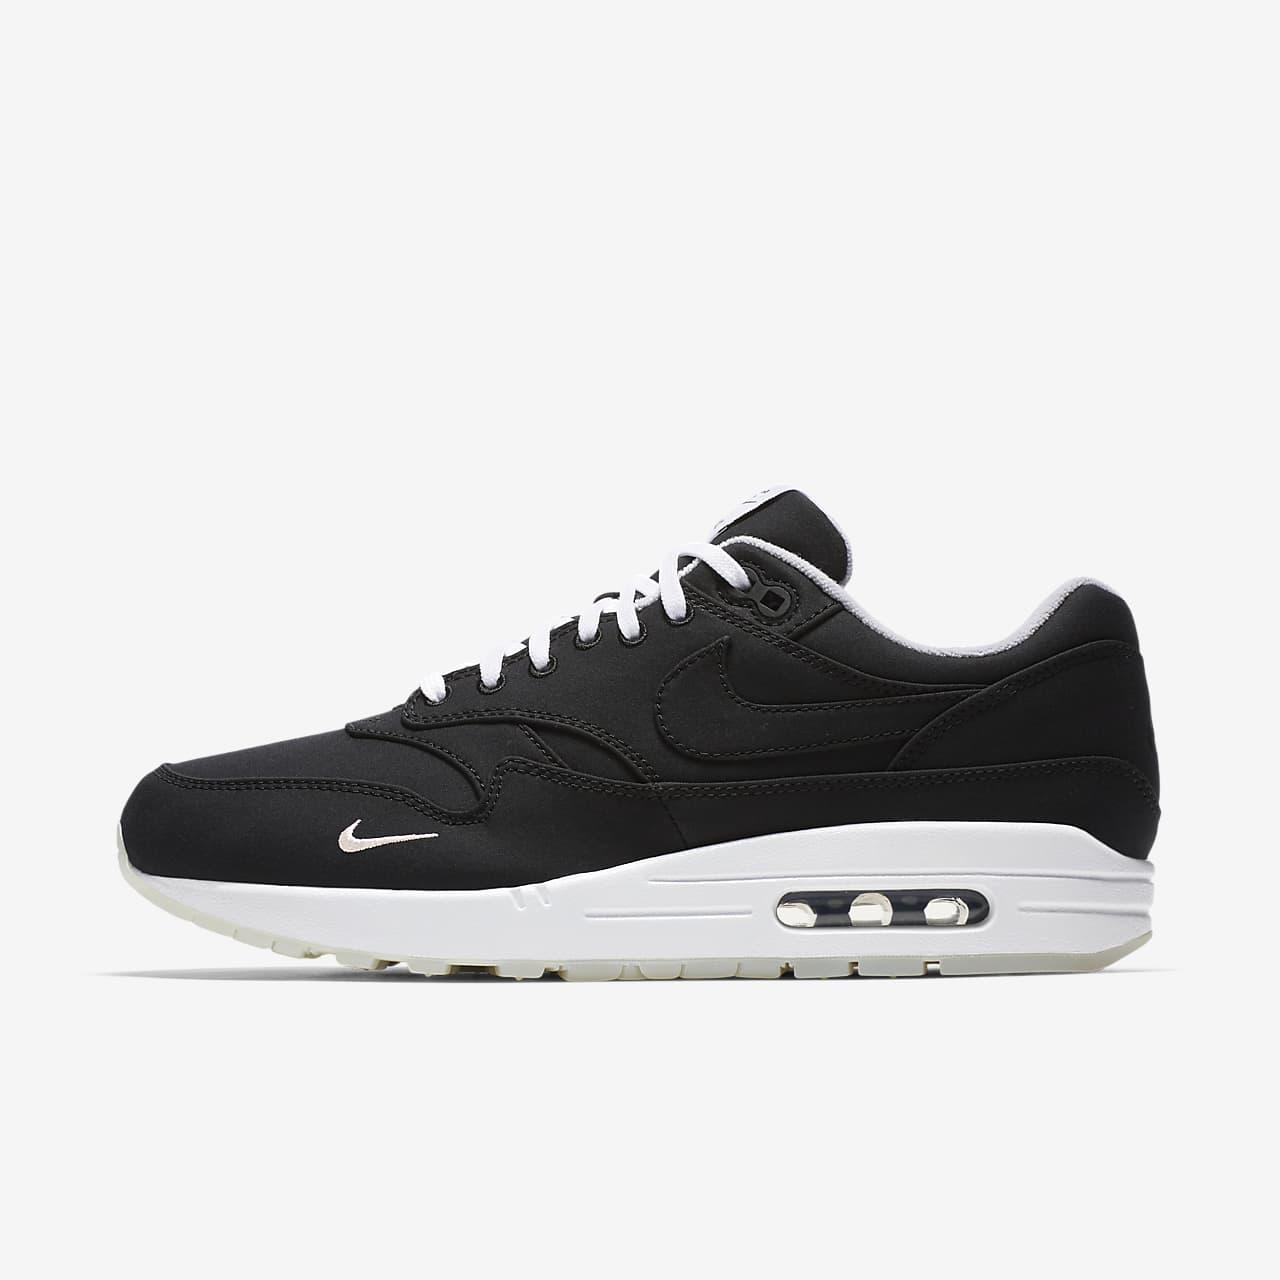 Nike Air Max 1 / DSM 男子运动鞋